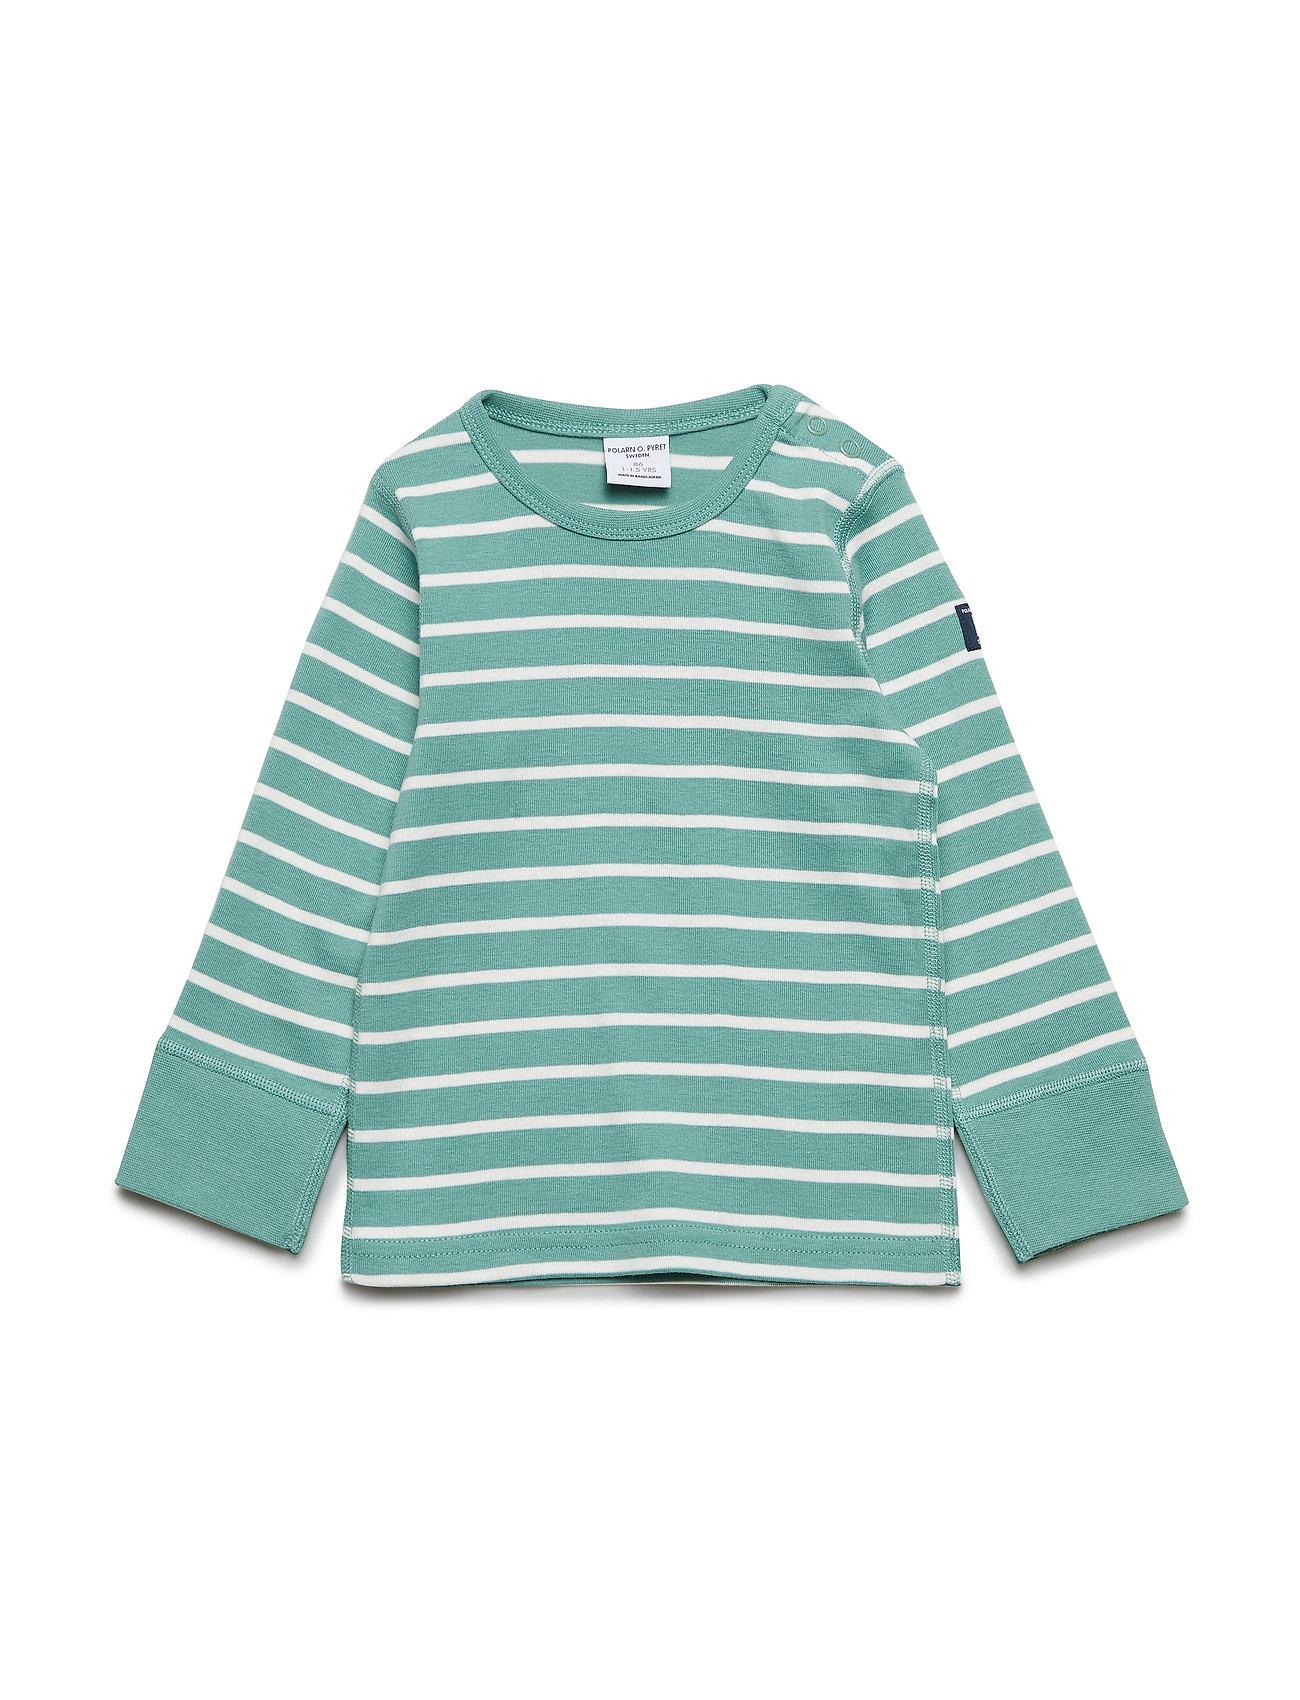 Polarn O. Pyret T-shirt Long Sleeve Stripe Preschool